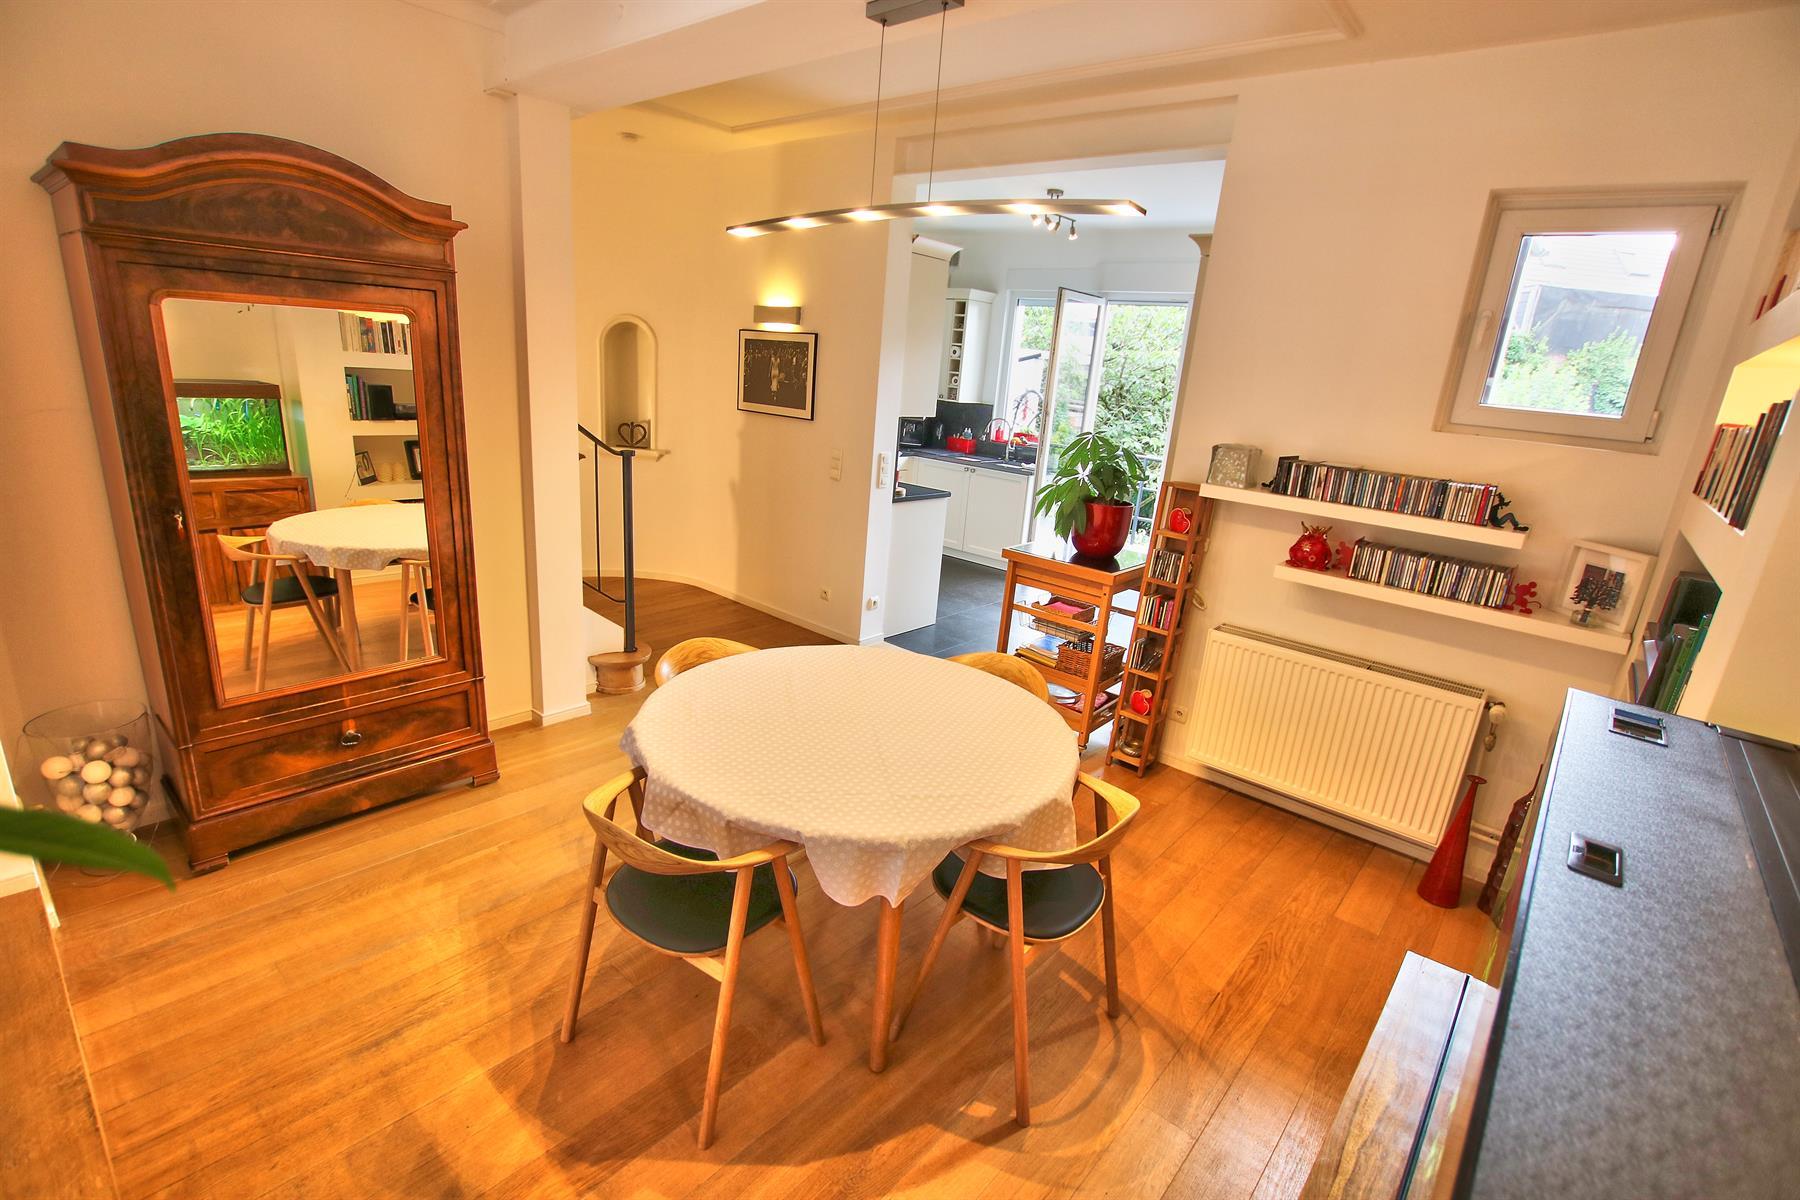 Maison - Etterbeek - #4454540-5